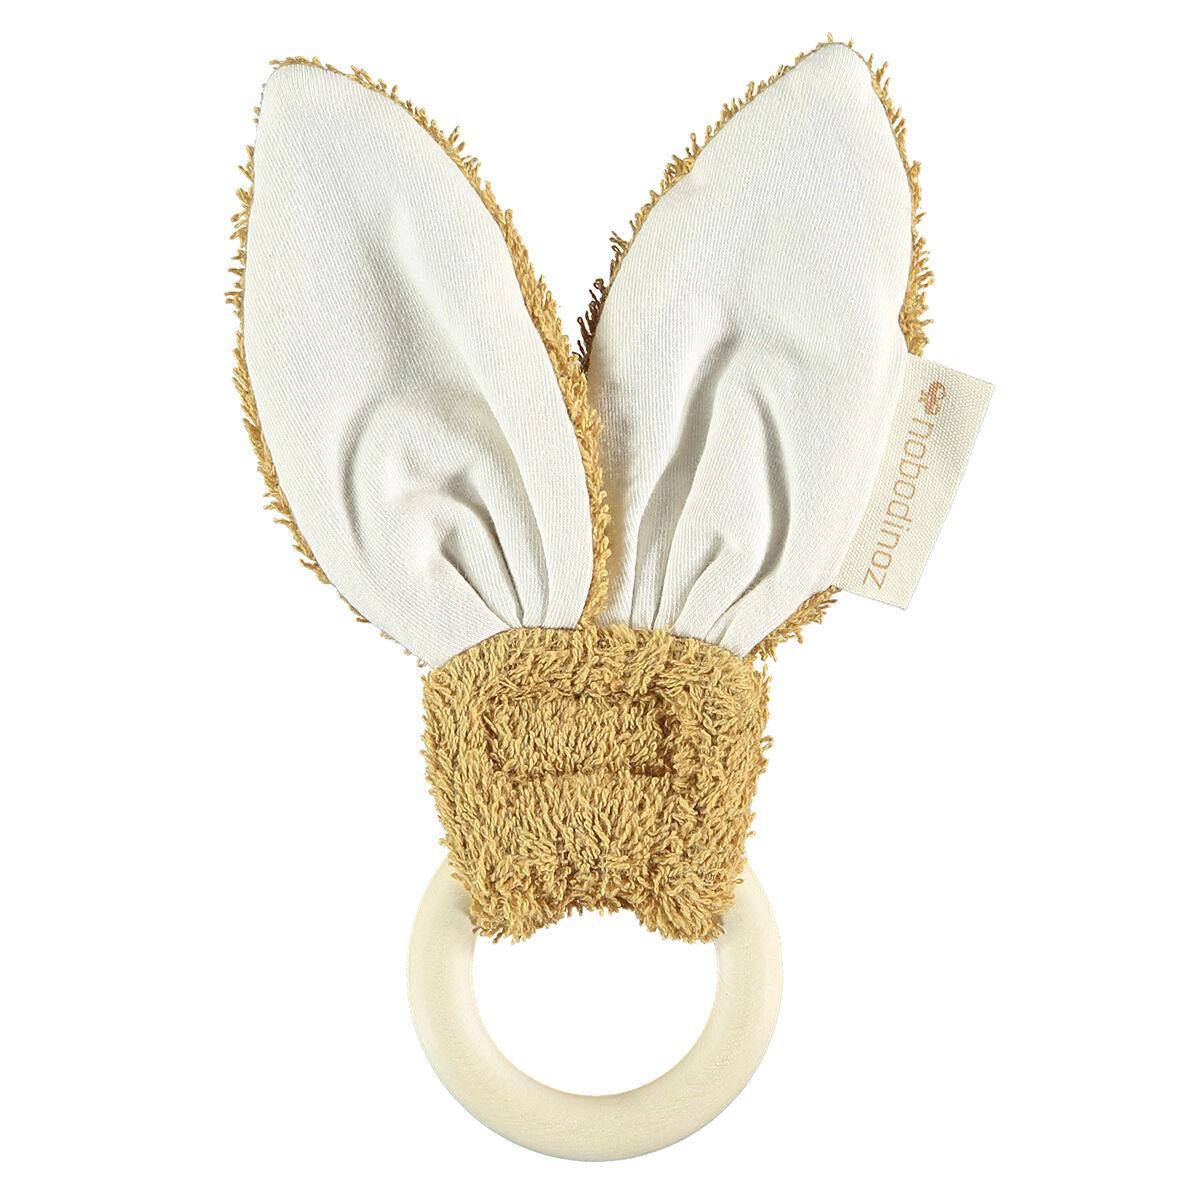 Nobodinoz Anneau de Dentition Bunny - Caramel